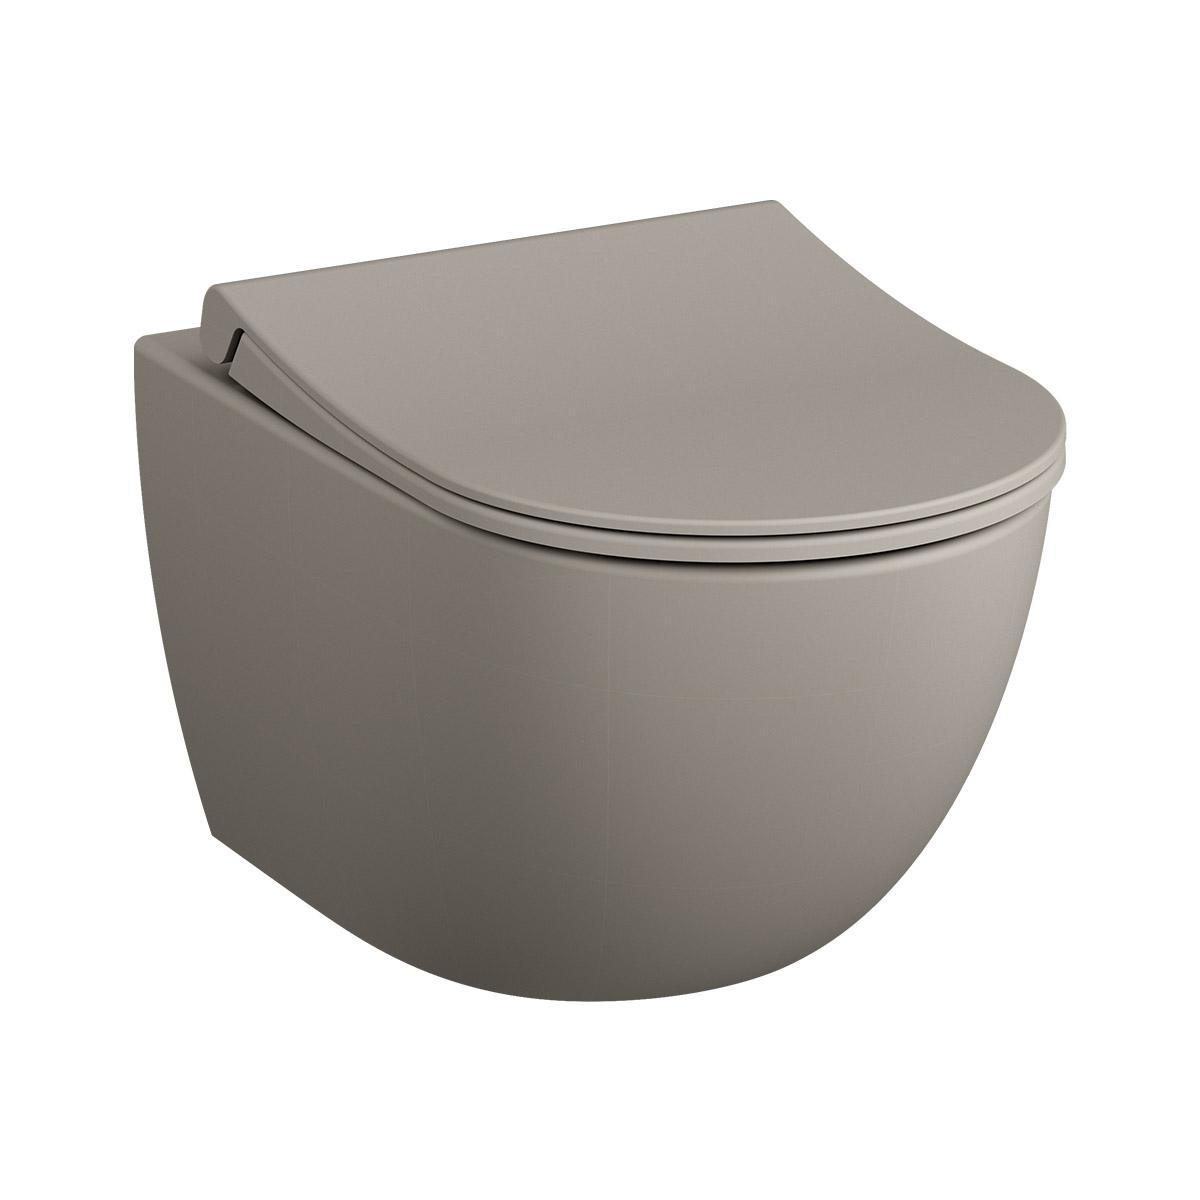 Sento Wand-WC VitrA Flush 2.0 mit Bidetfunktion, Taupe Matt